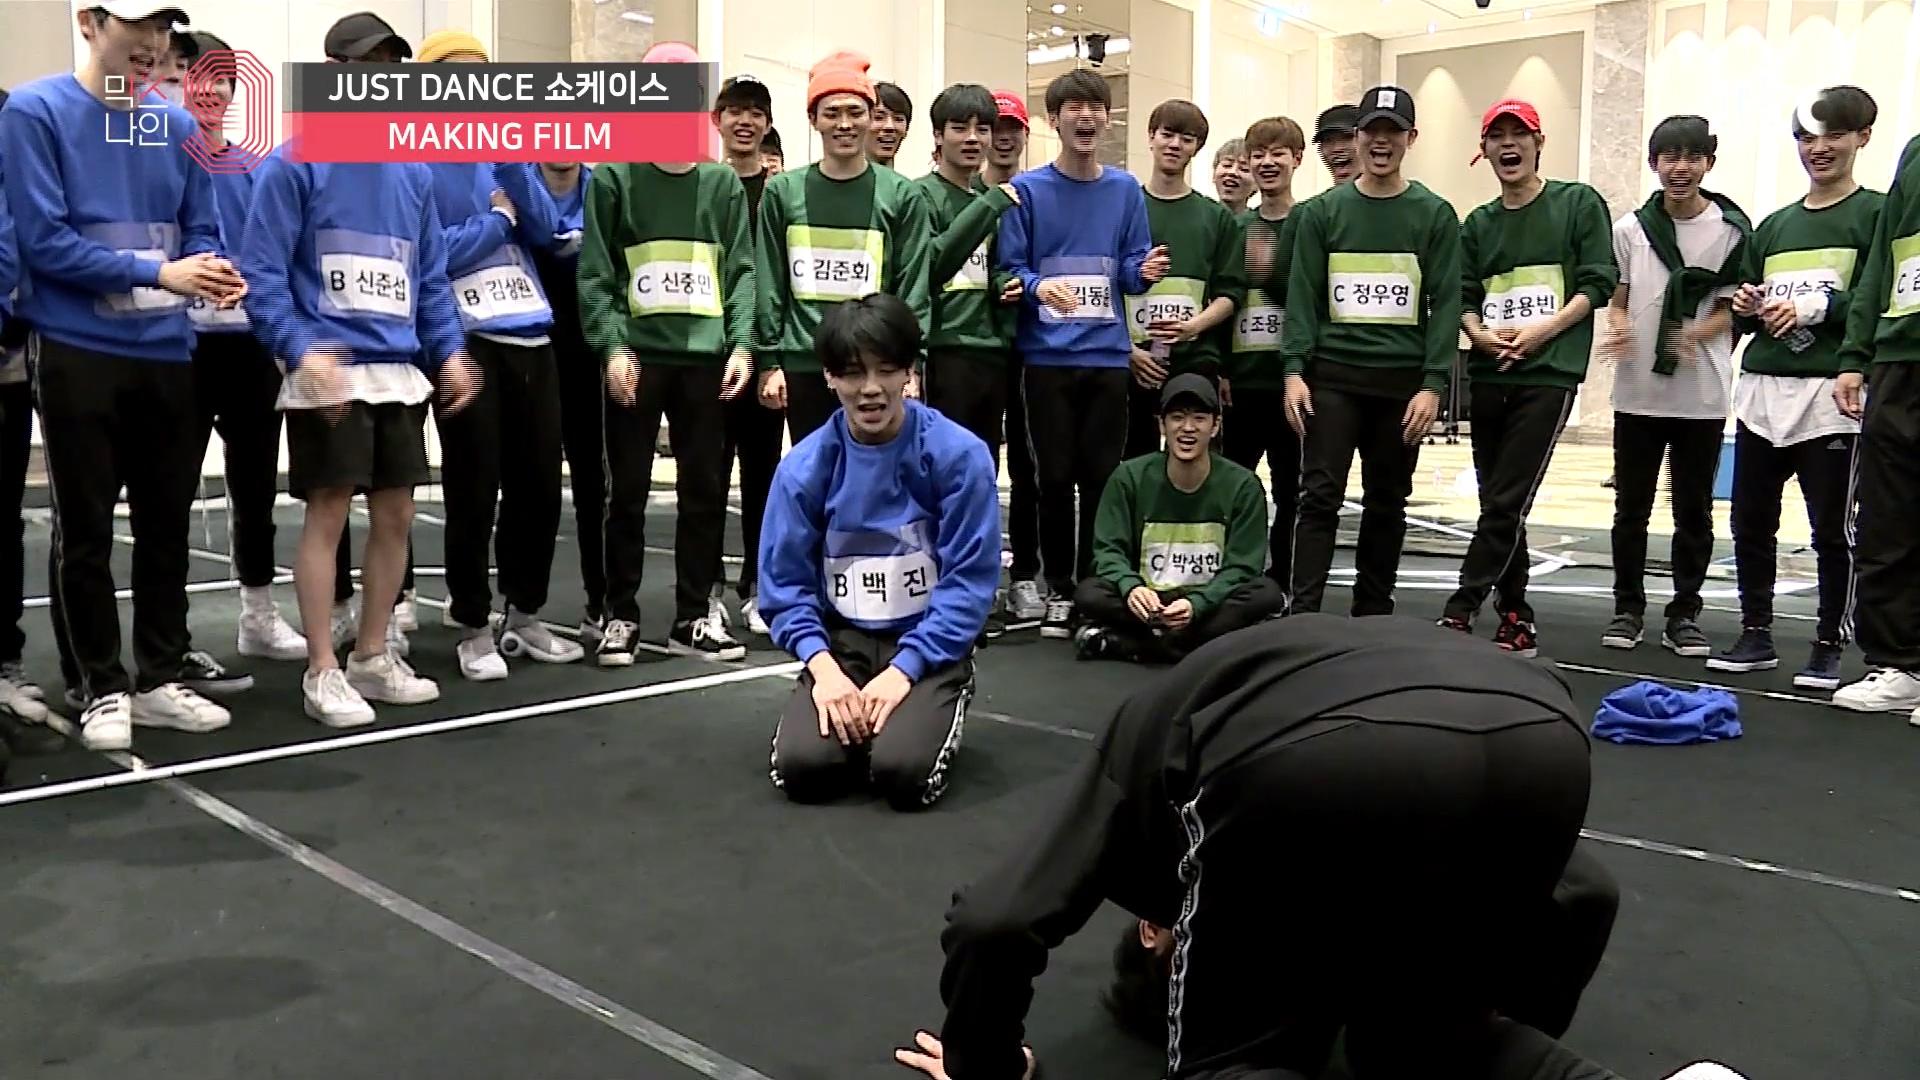 """JUST DANCE"" 소년X소녀 MAKING FILM"